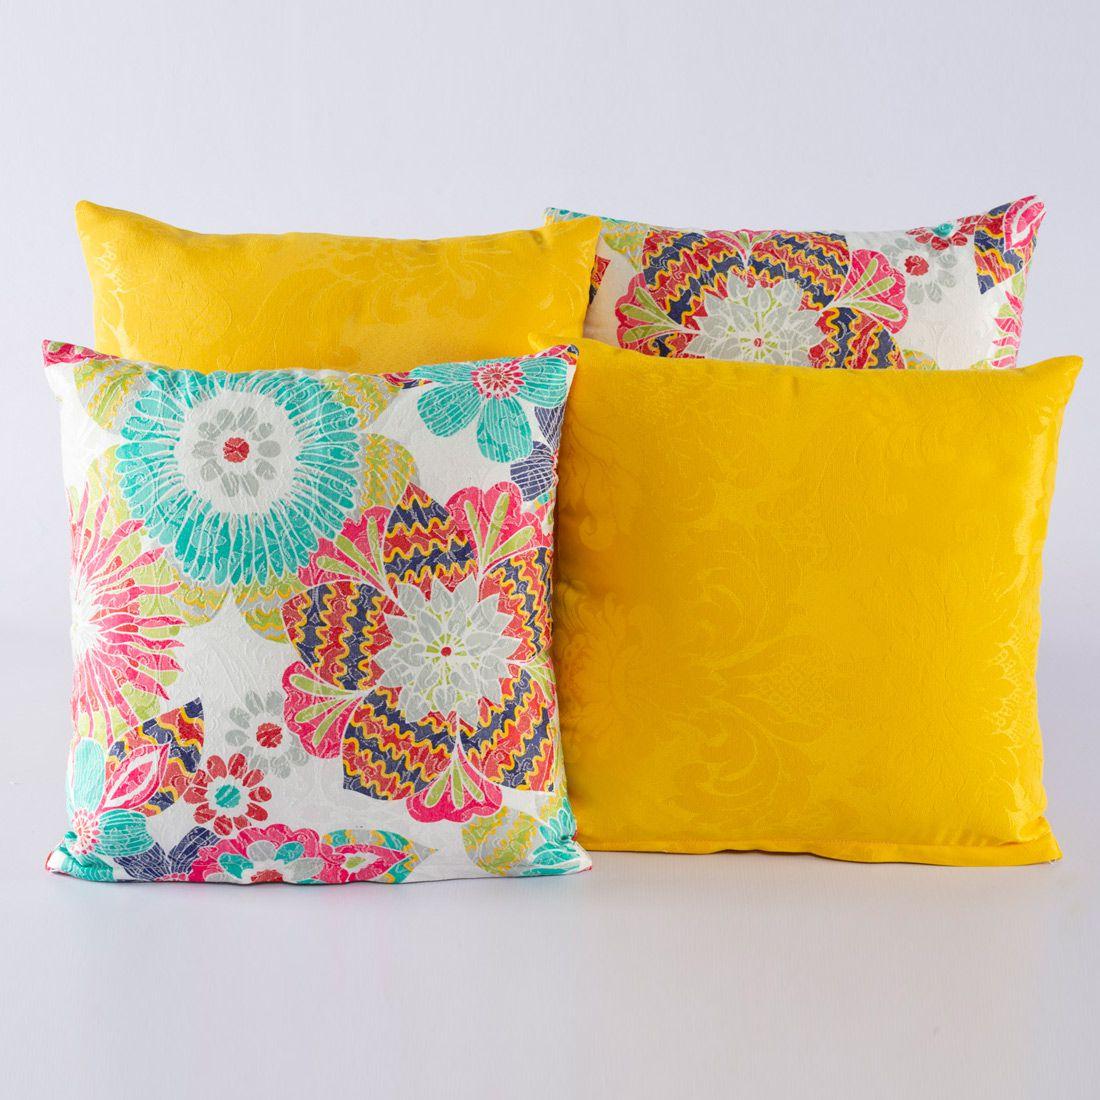 Kit c/ 4 Almofadas Cheias Decorativas Floral Colorido/Amarelo